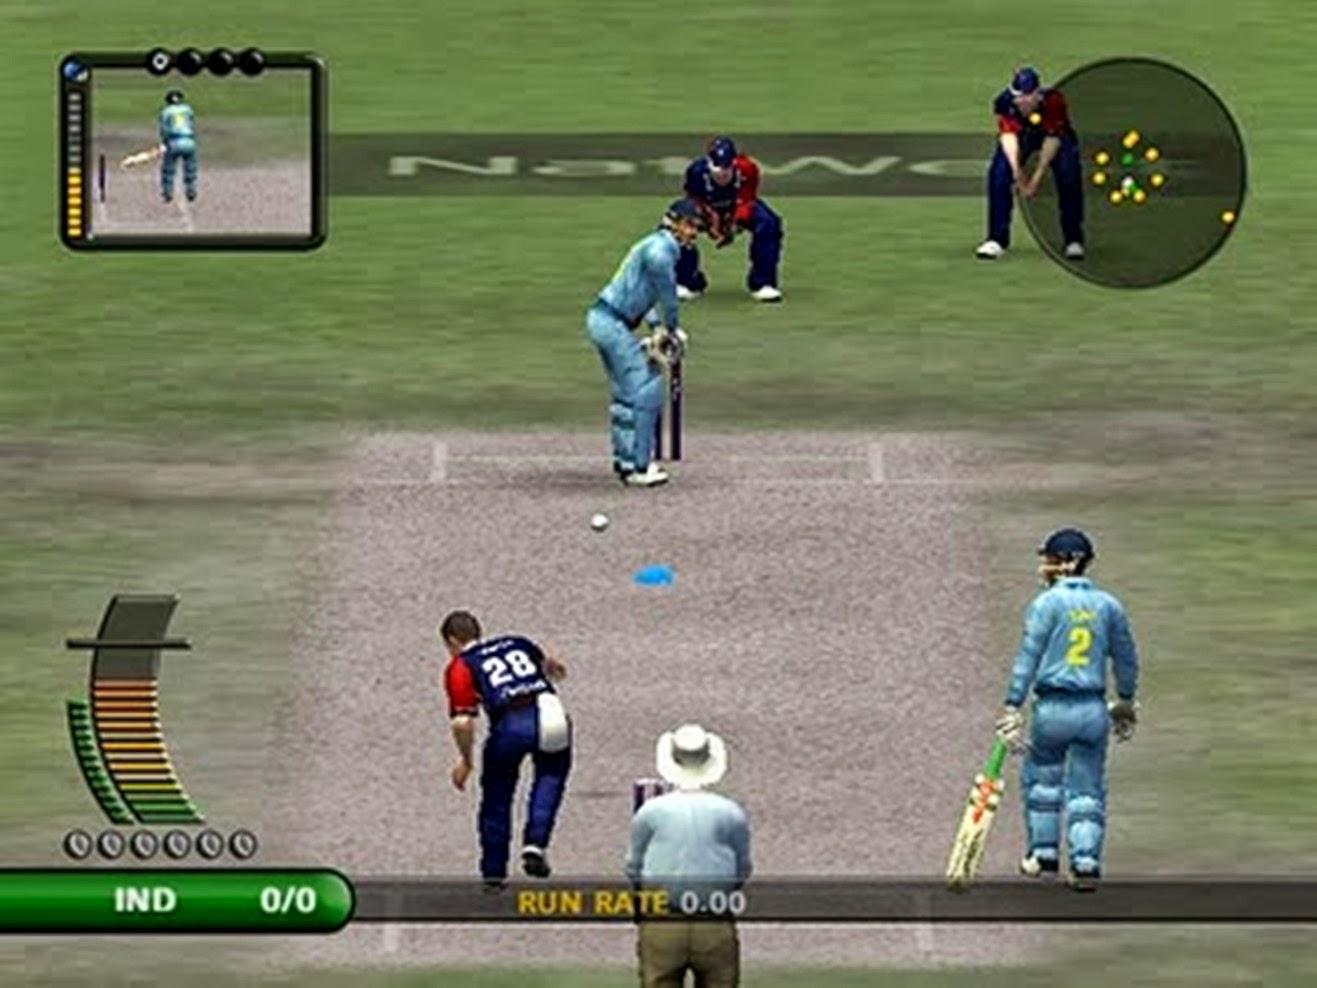 Cricket Games Free Download Full Version - Free downloads ...